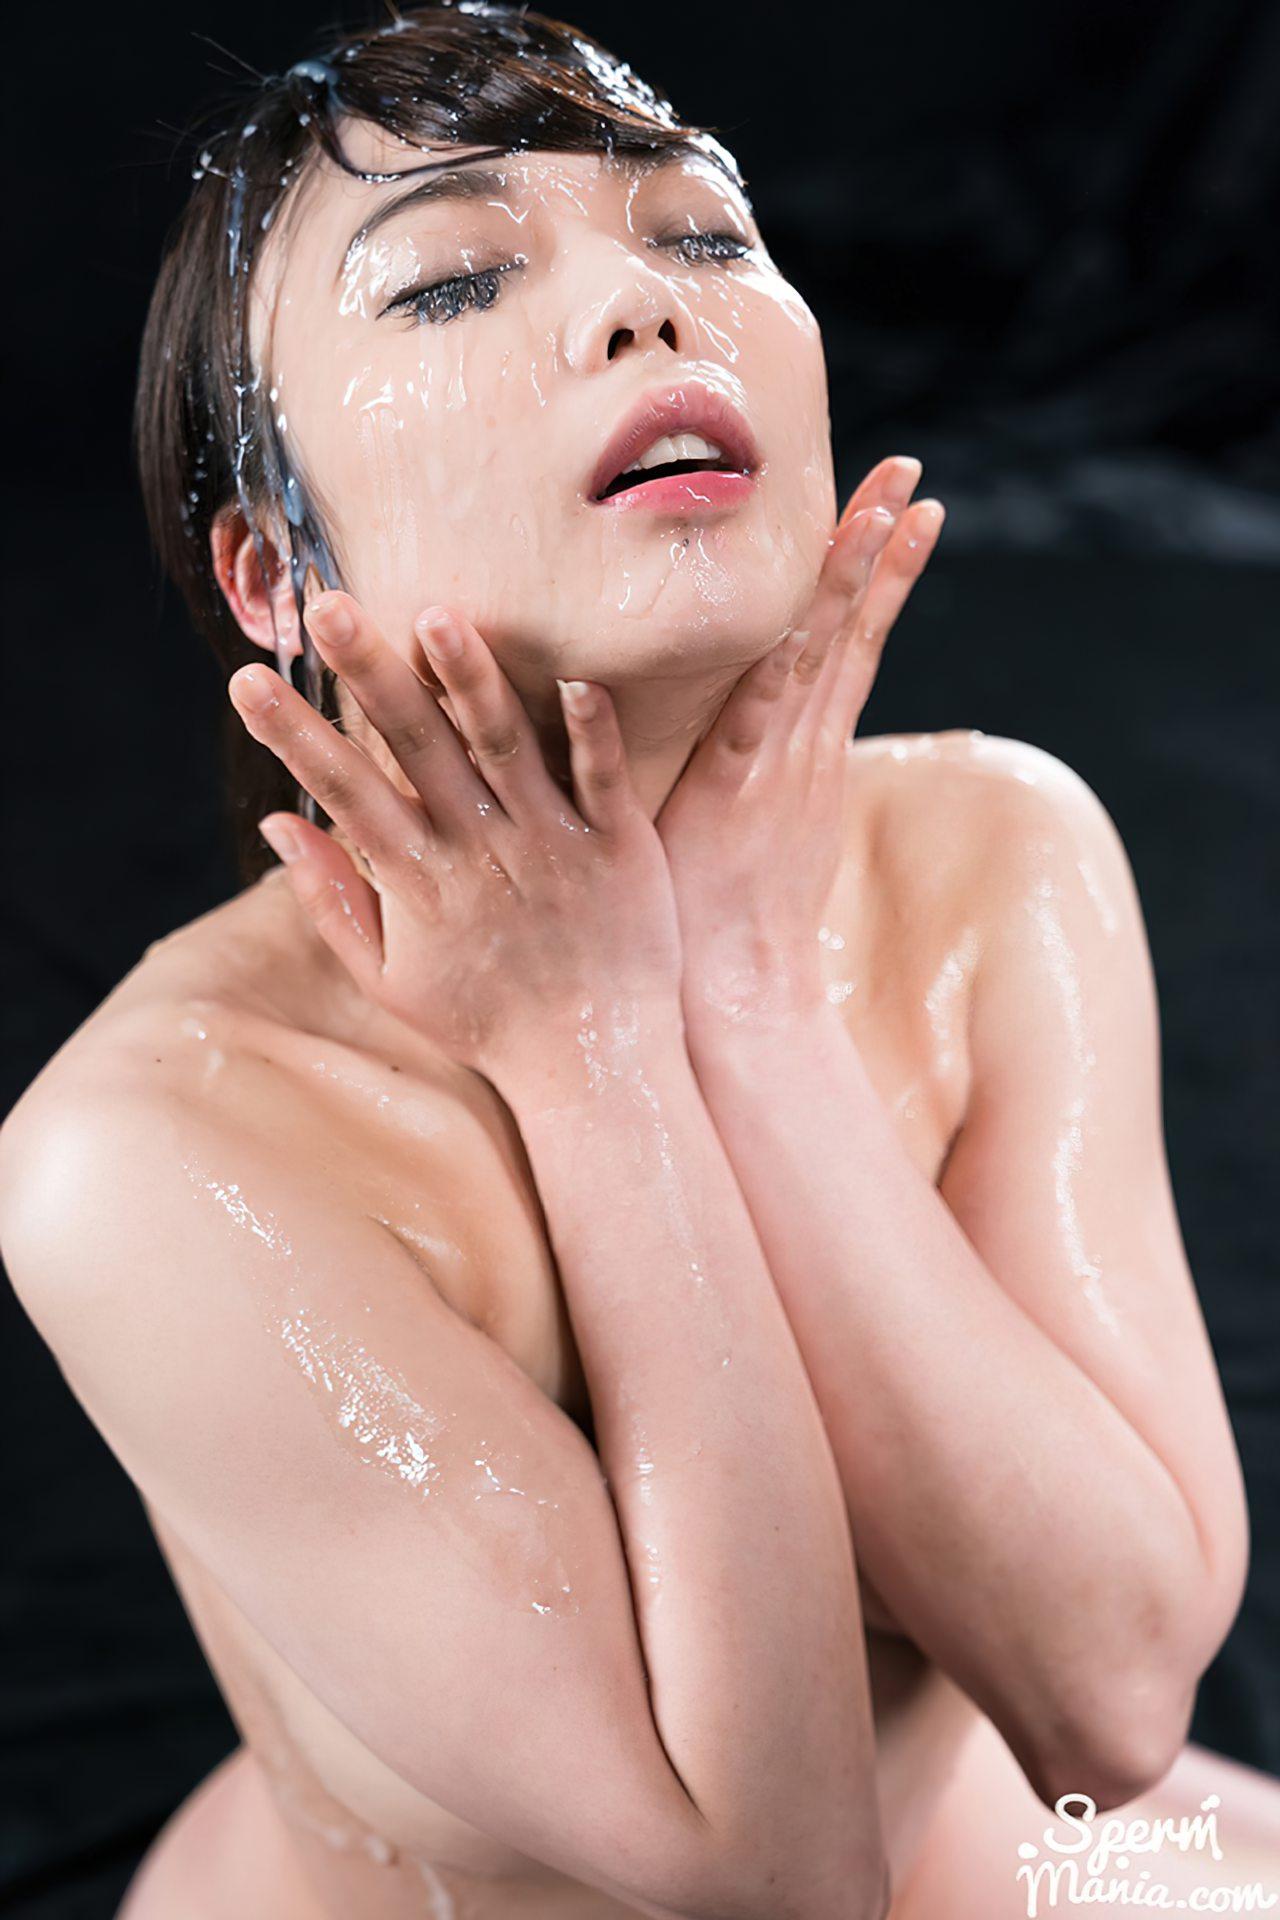 Mulher Japonesa Coberta de Porra (13)